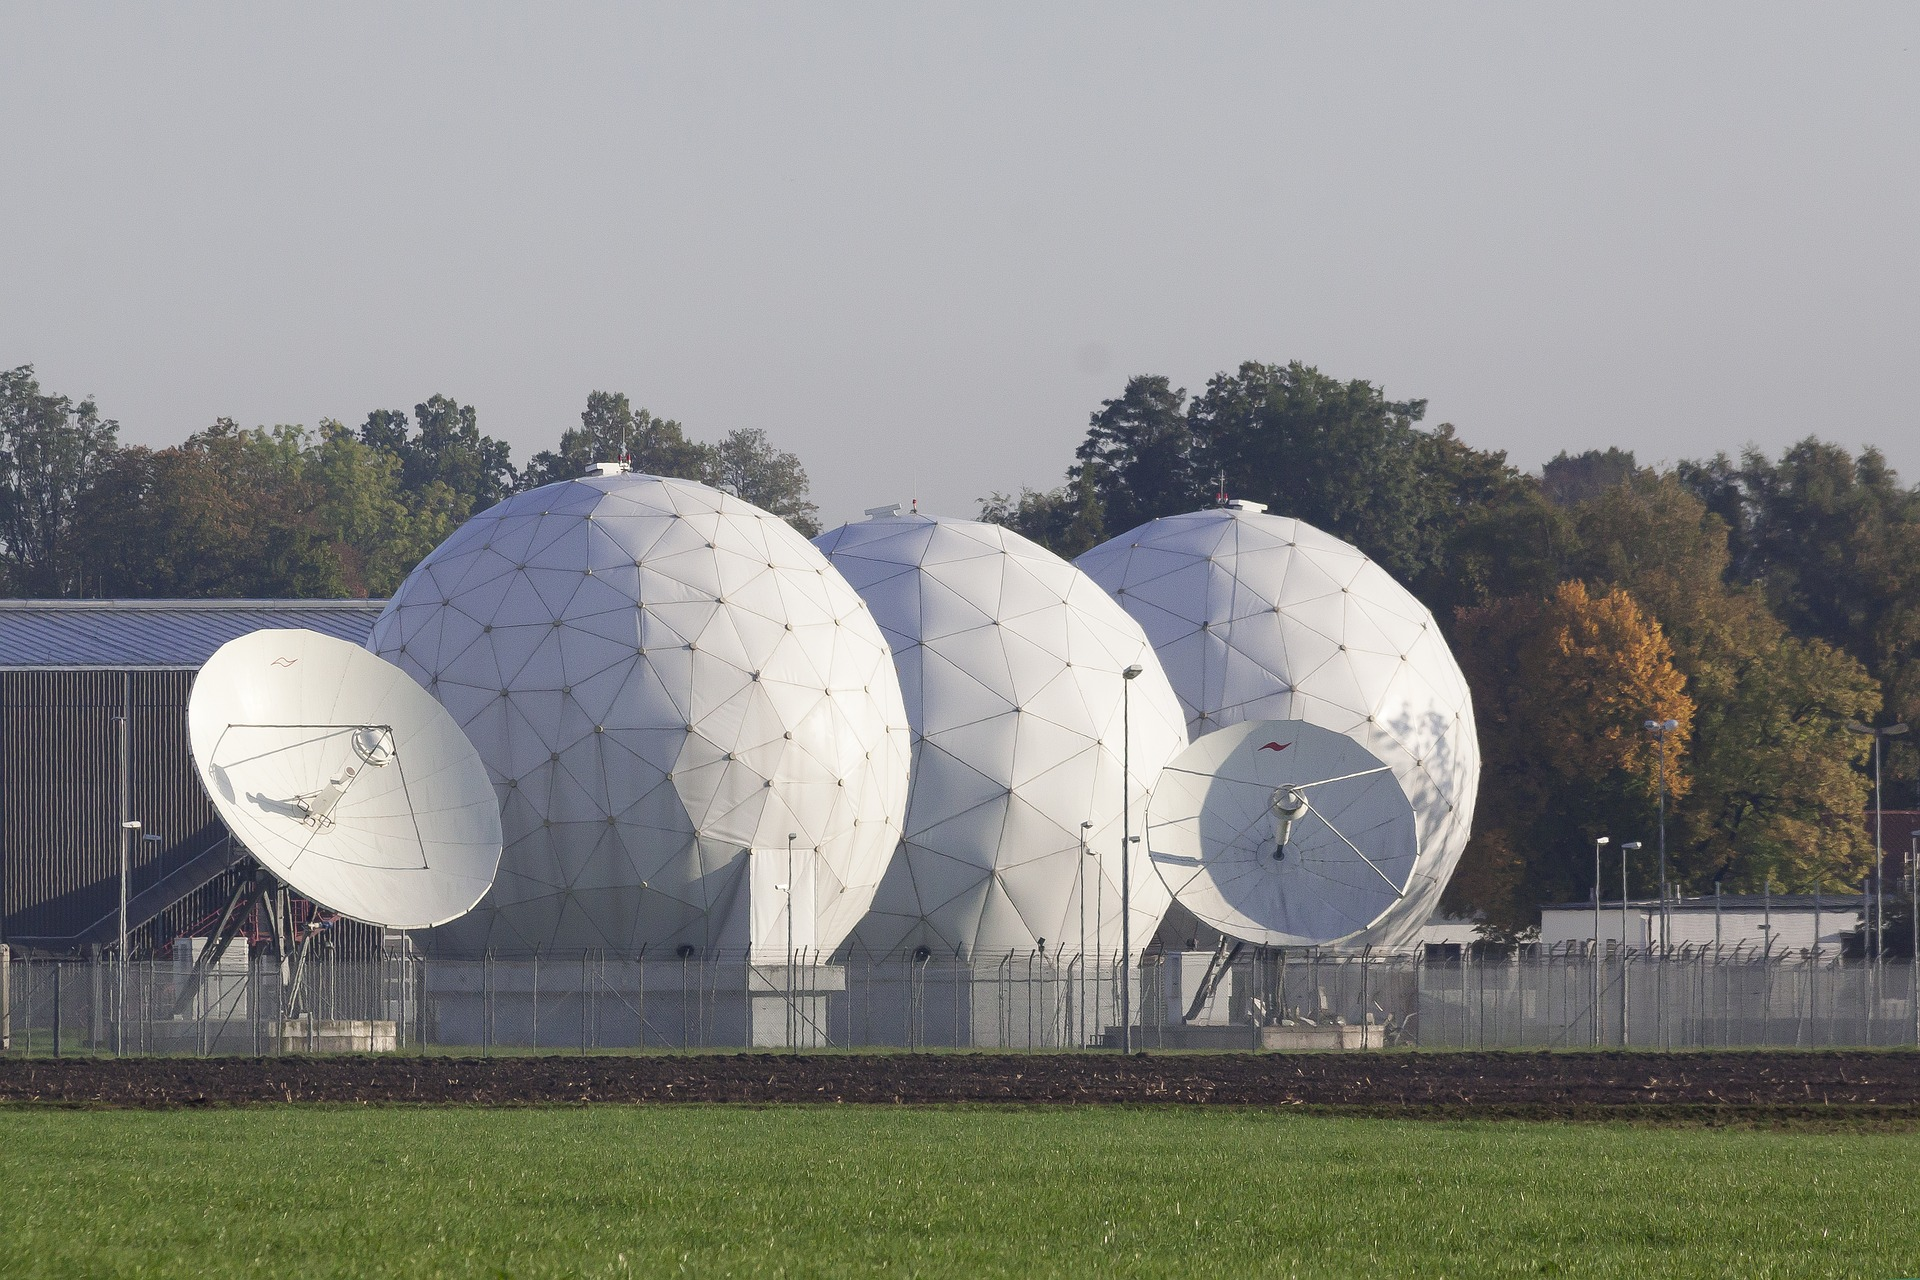 Meteo radar